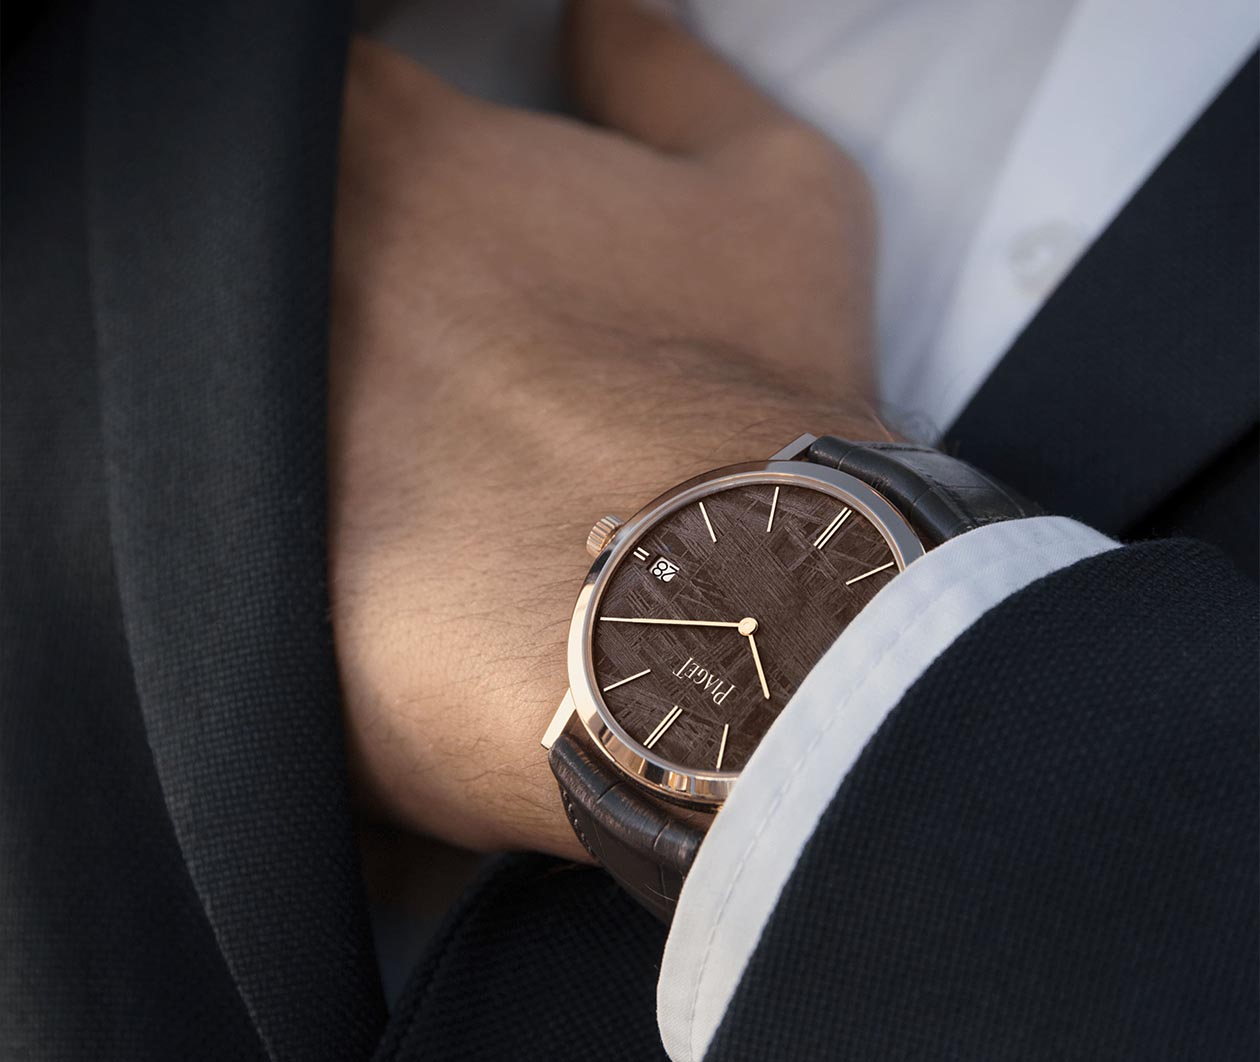 Piaget Altiplano watch G0A44051 Carousel 5 FINAL